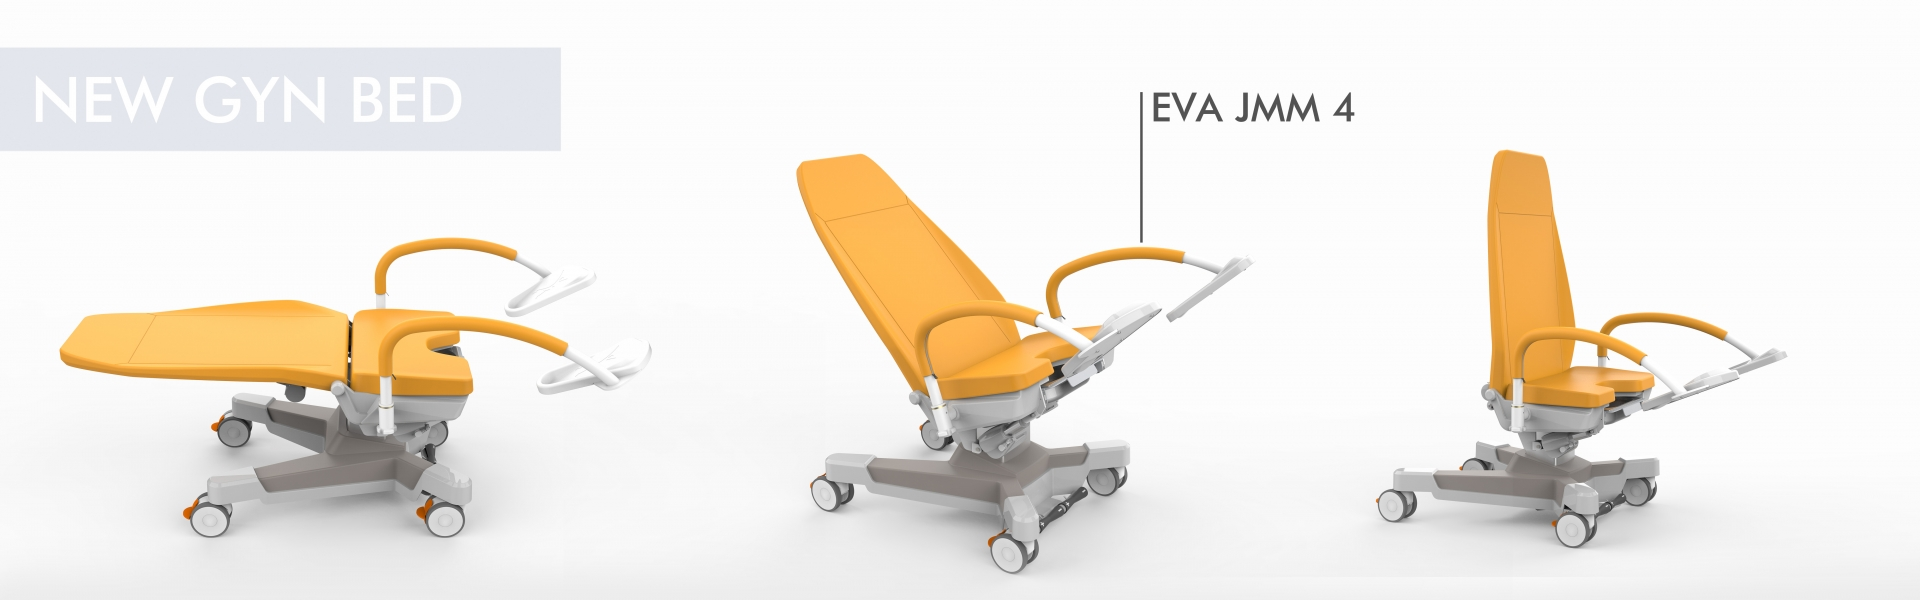 jmm eva 04